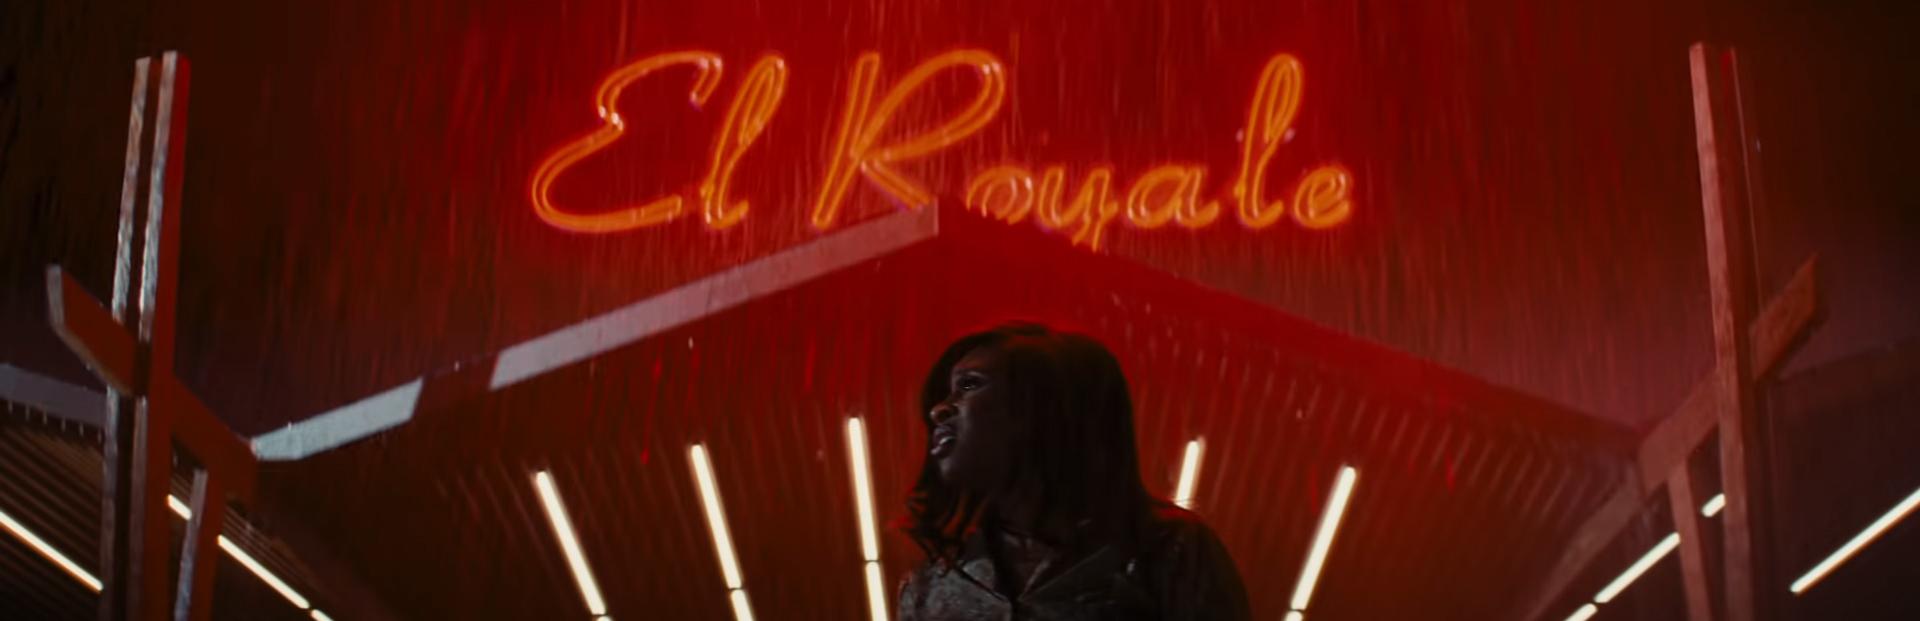 Bad Times at the El Royale. Image Credit: 20th Century Fox